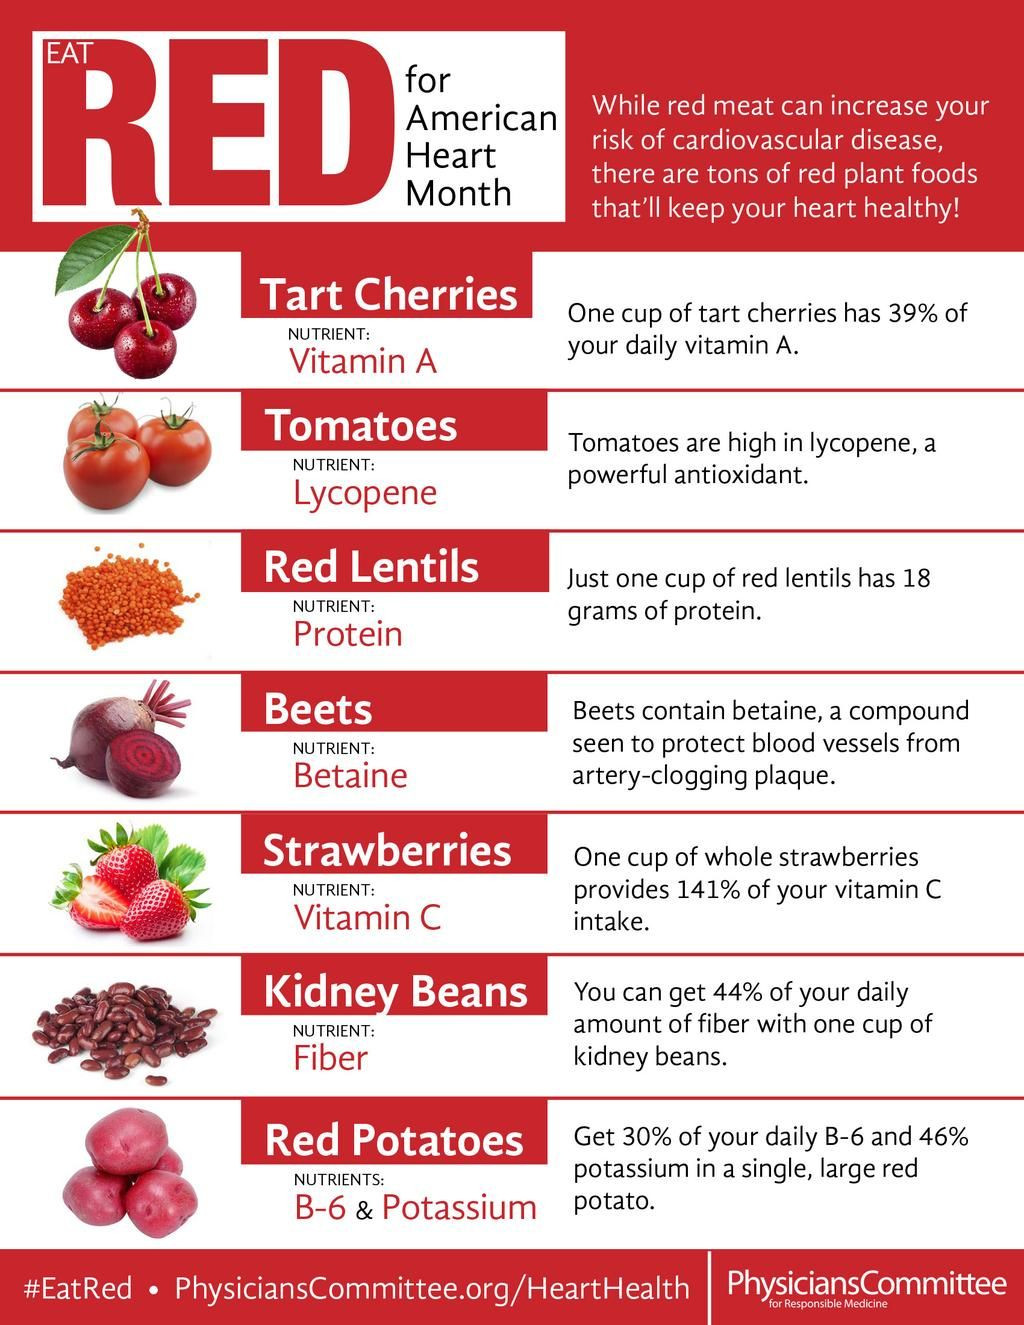 Heart Healthy Breakfast Menu  Physicians mittee on plantbased t